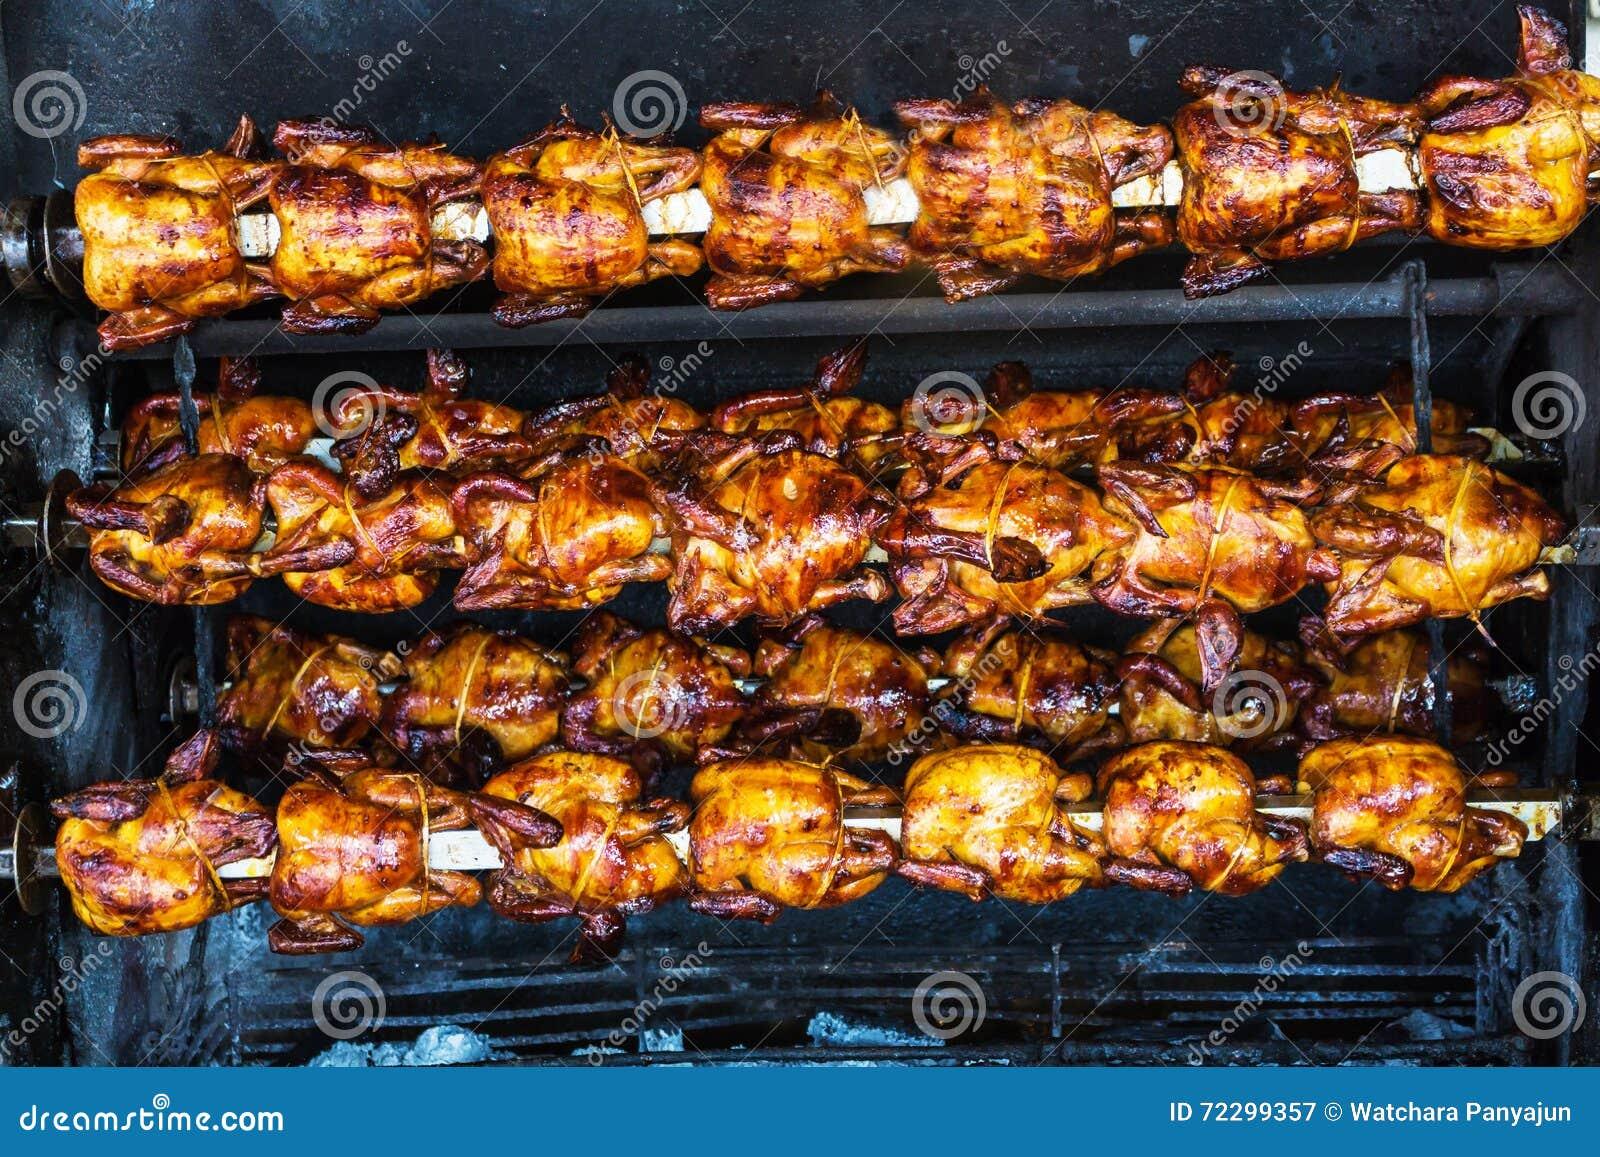 Download Фотоснимок 2 филе цыпленка стоковое изображение. изображение насчитывающей еда - 72299357